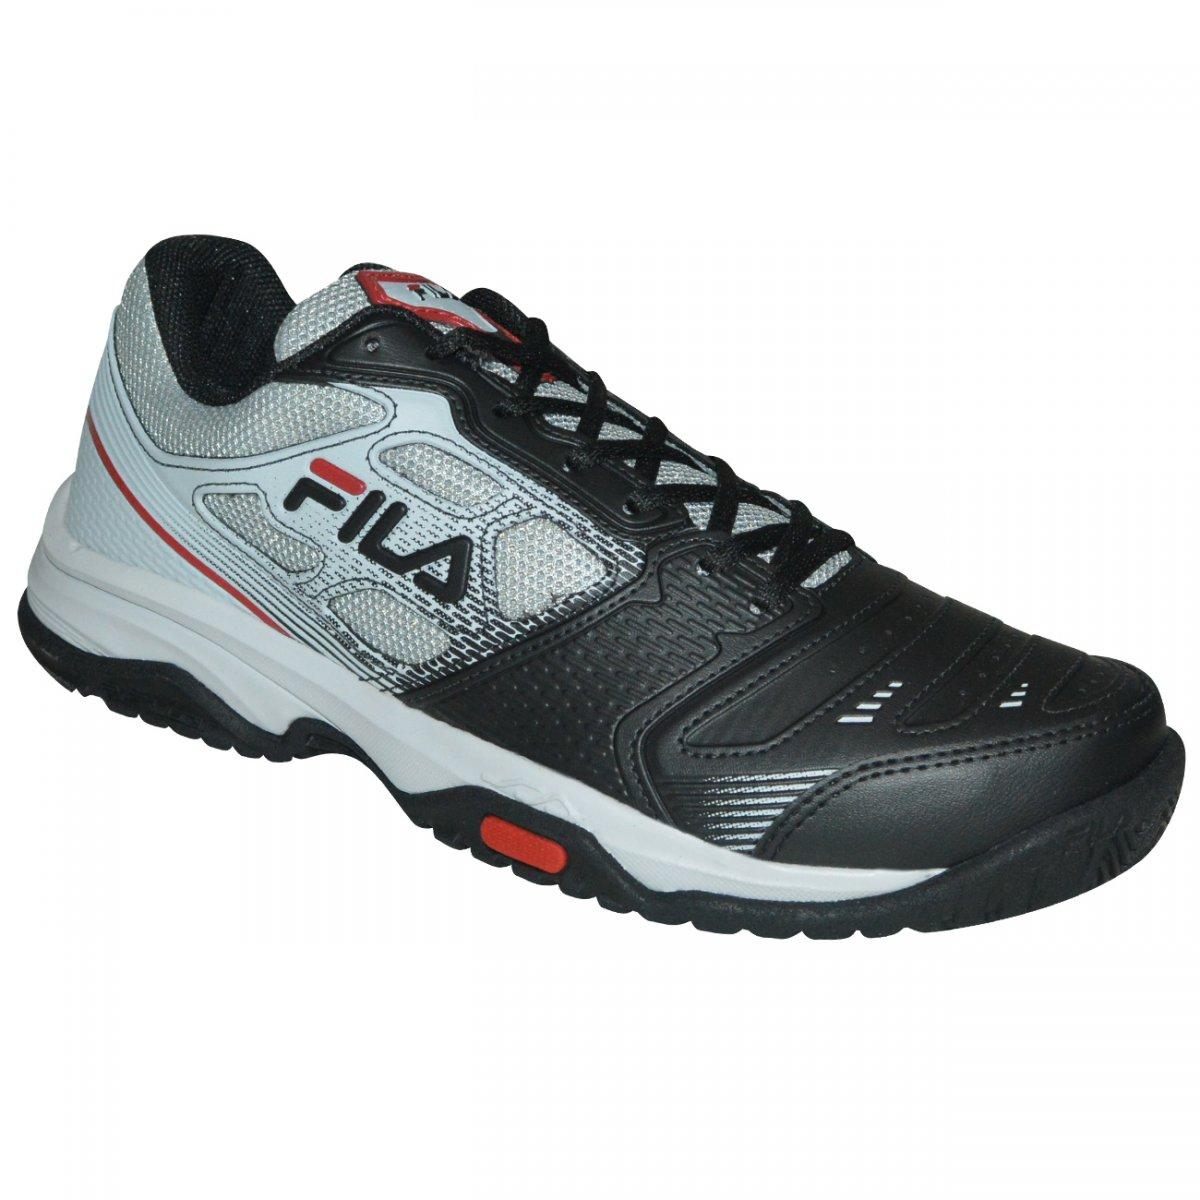 Tenis Fila Top Spin 2.0 744722 - Preto prata vermelho - Chuteira Nike dfd90b7ed2781